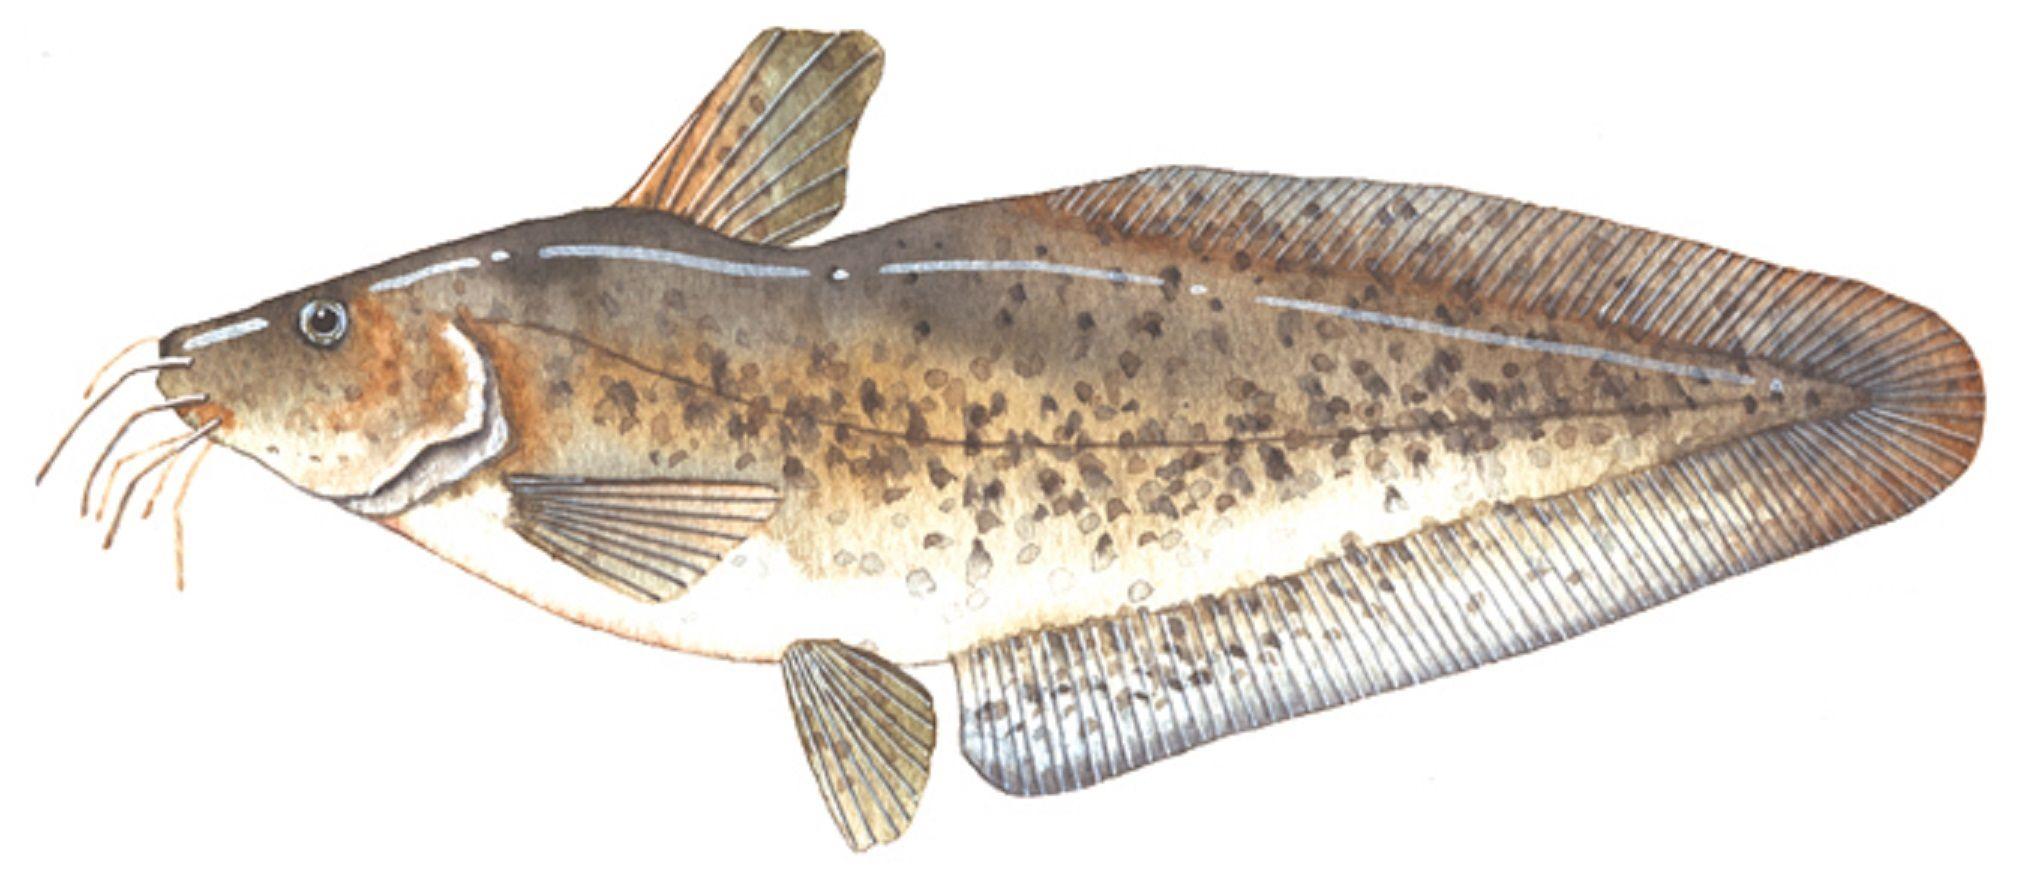 Freshwater fish in australia - Art Illustration Lakes Freshwater Fish Eel Tailed Catfish Tandanus